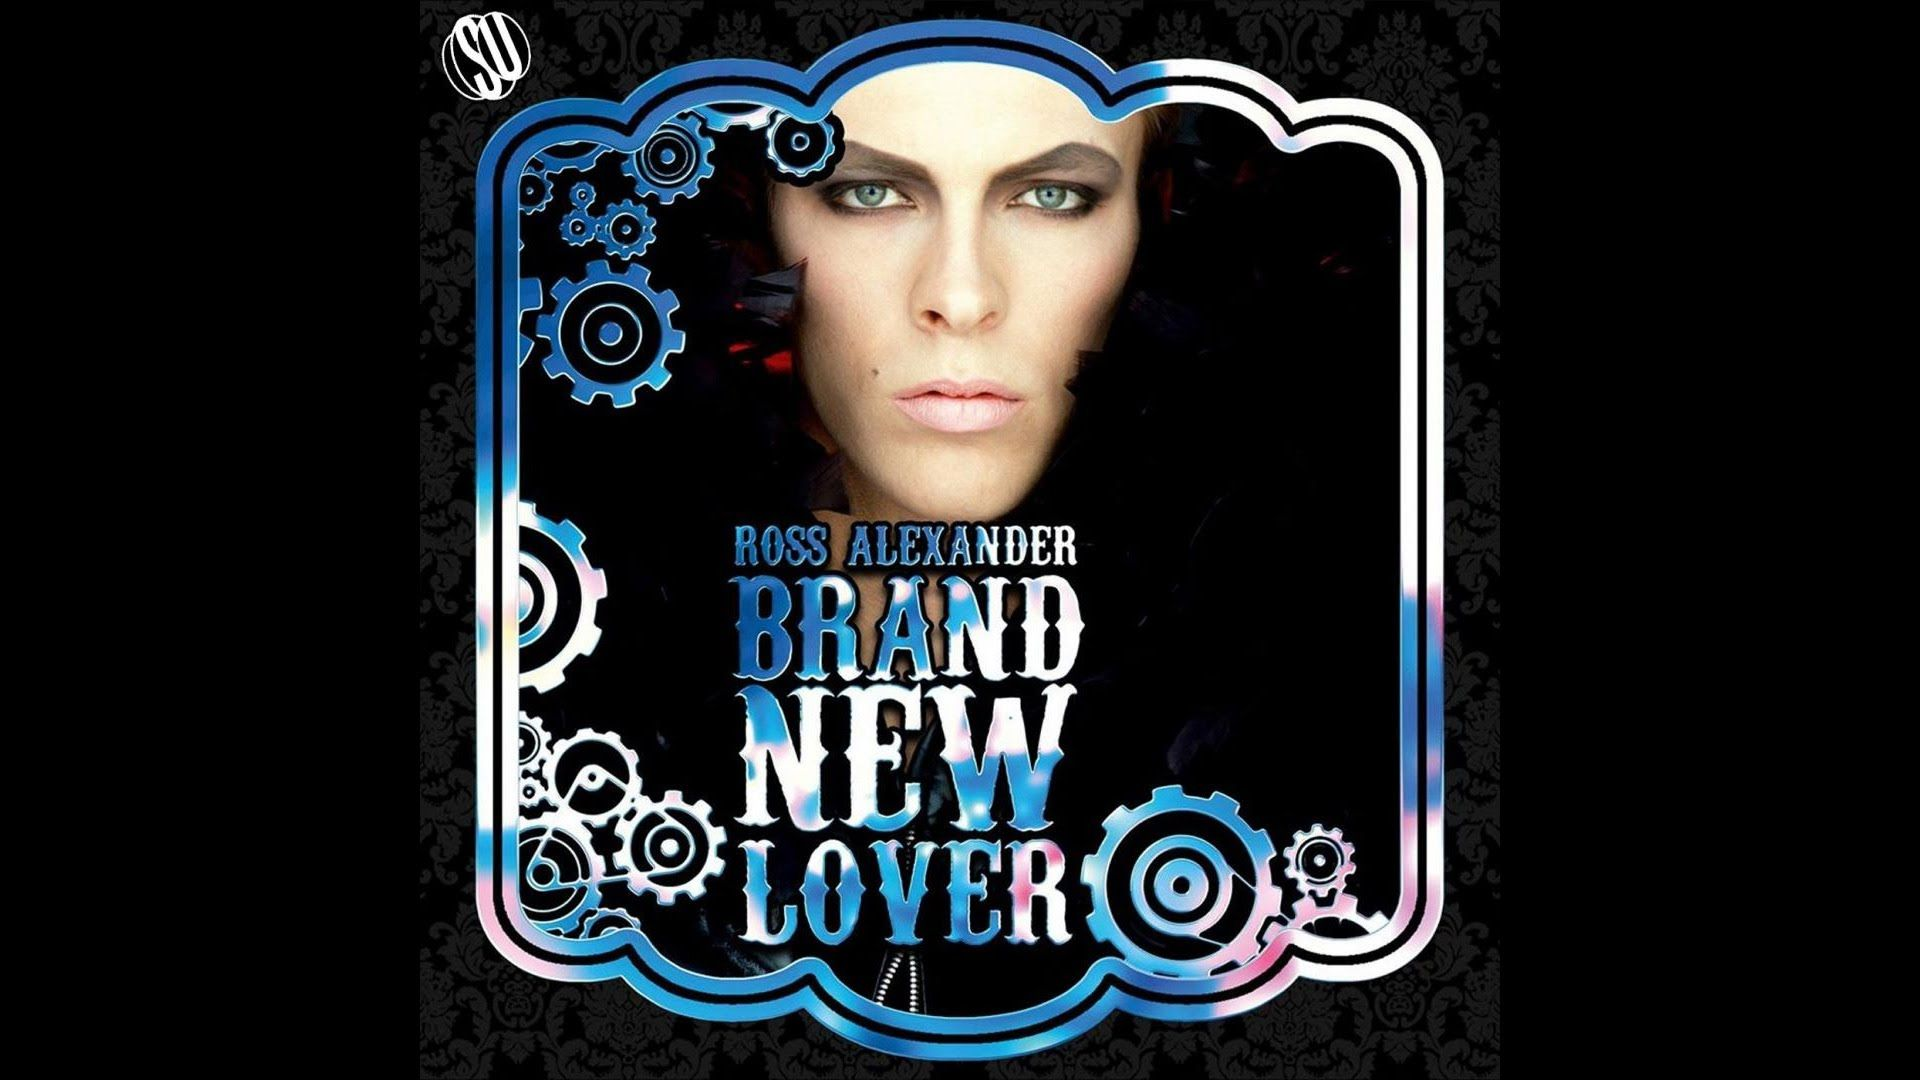 Ross Alexander Brand New Lover Matt Pop Radio Edit Disco Dance